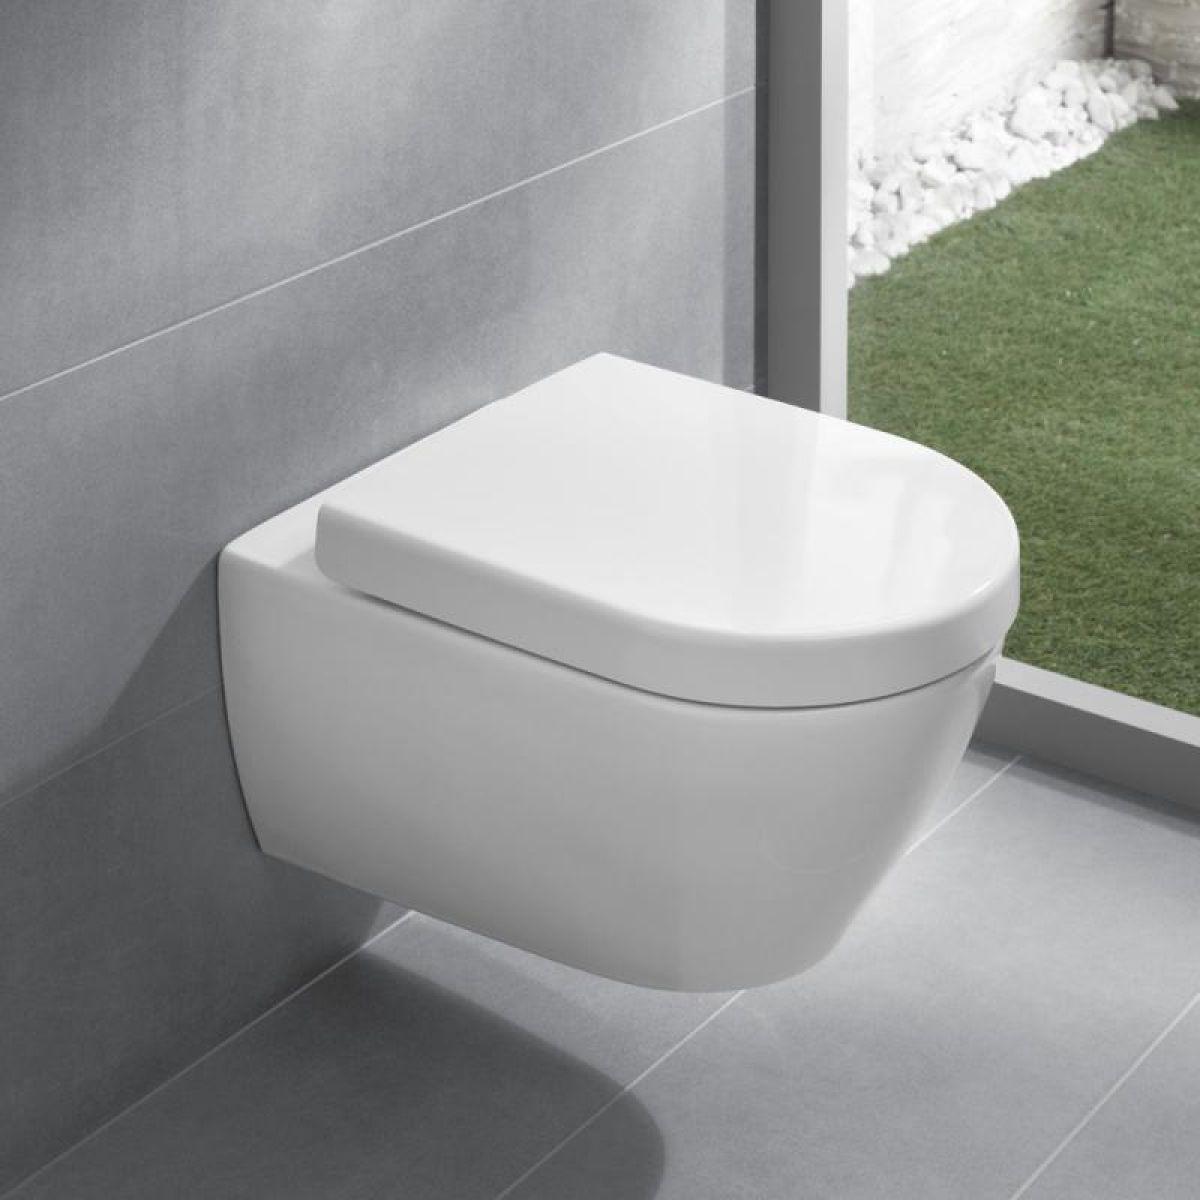 Villeroy And Boch Subway 2 0 Wall Hung Wc Floating Toilet Bathroom Inspiration Modern Bathroom Toilets